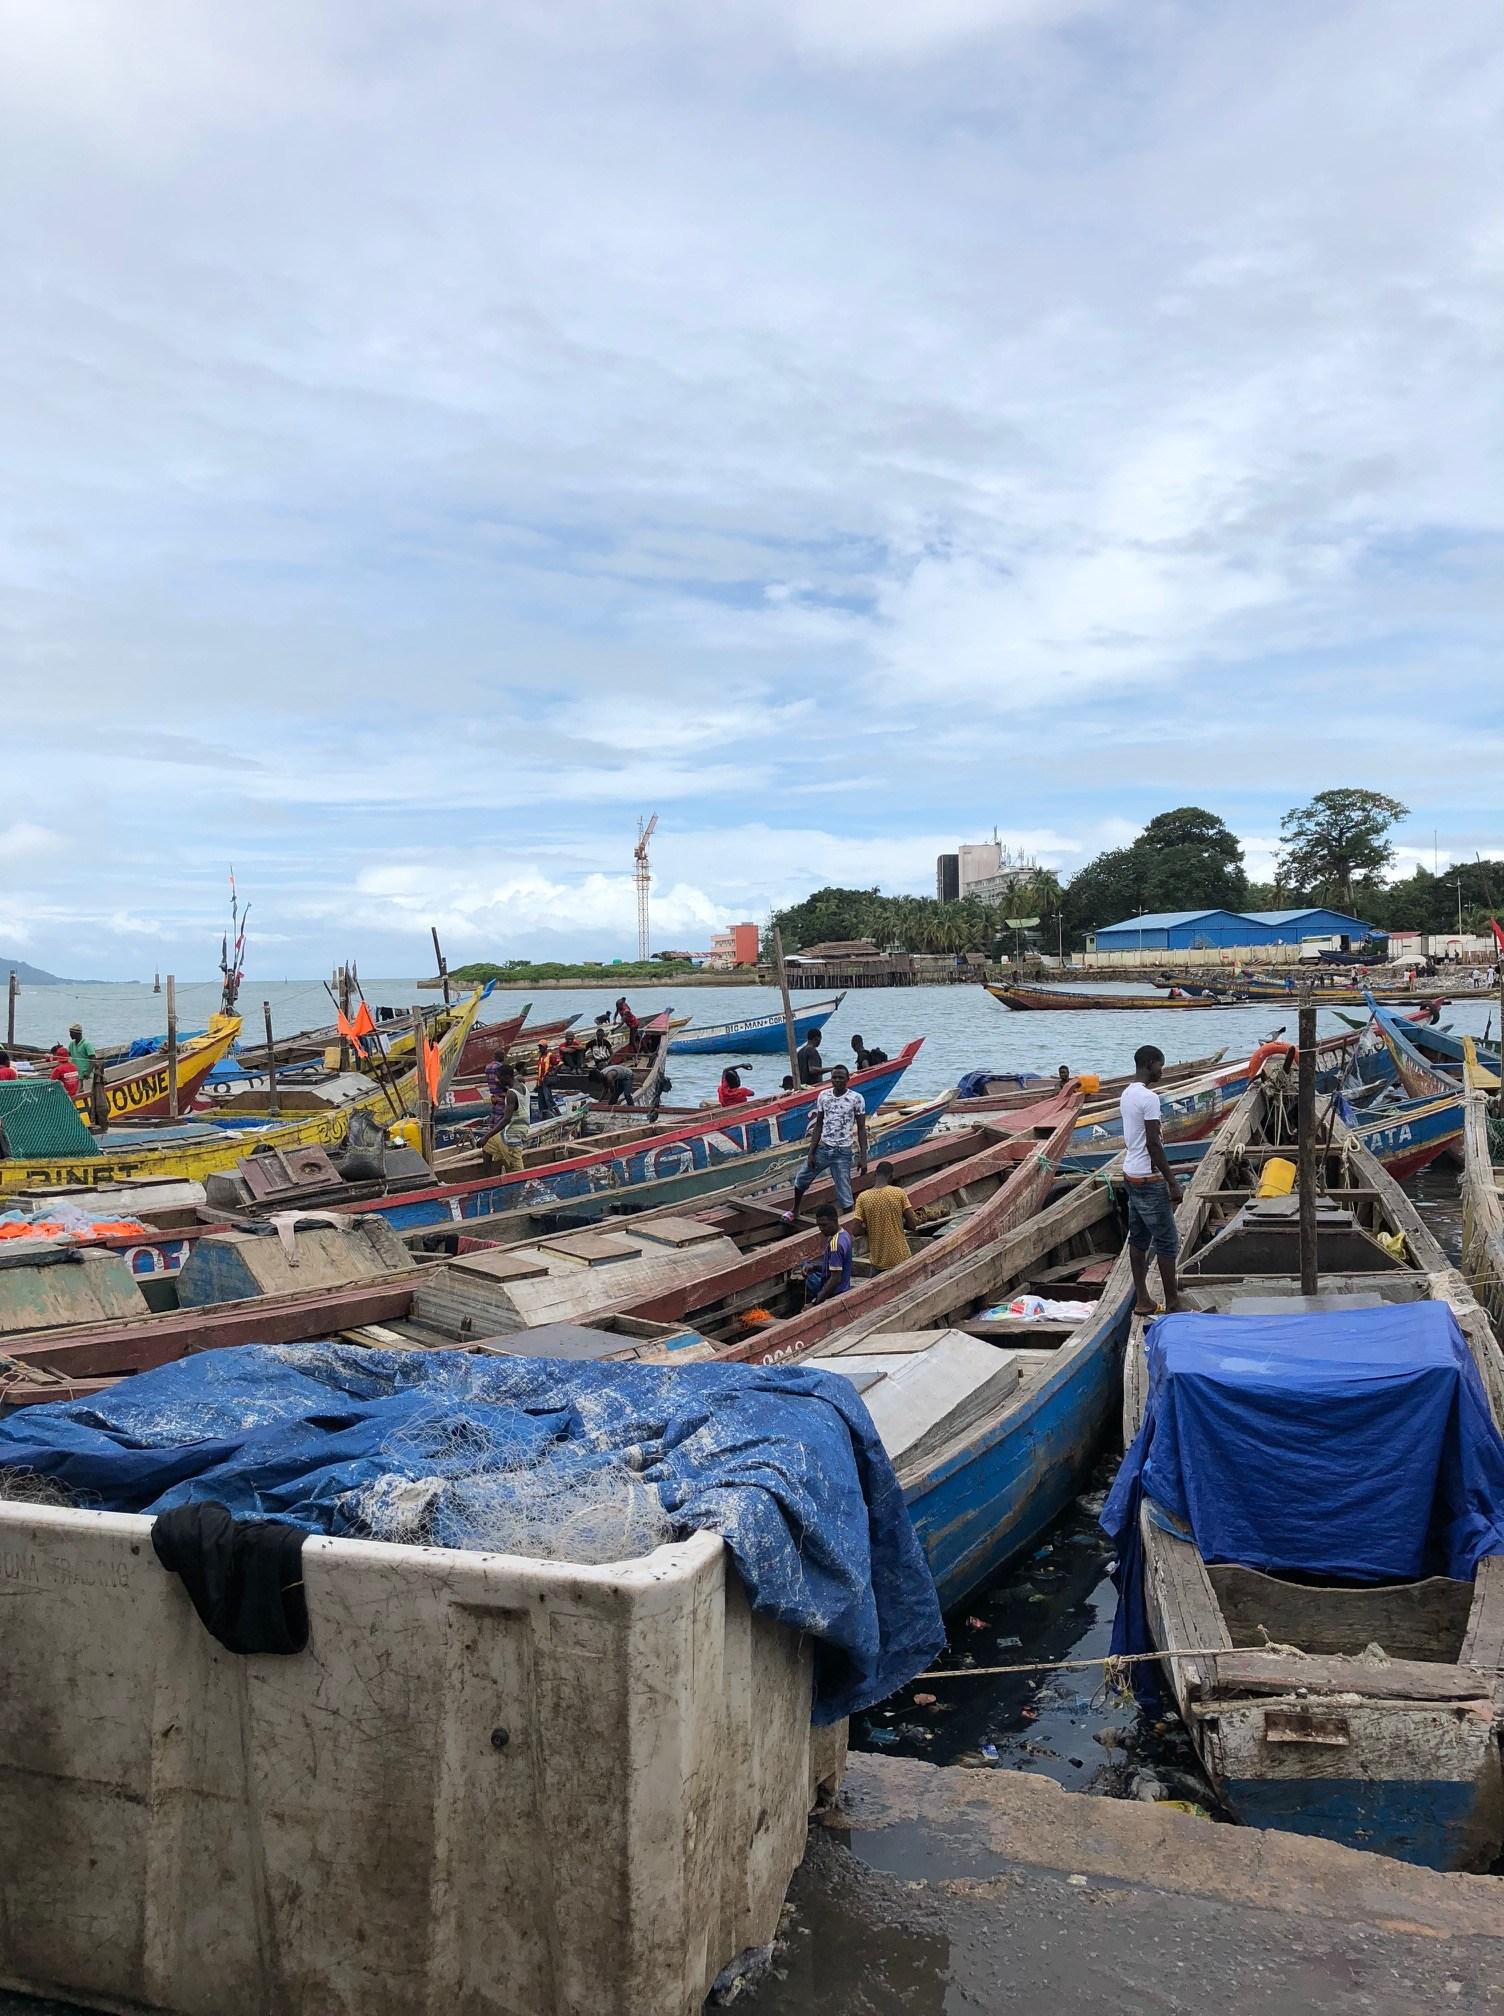 guinea seascape with boats